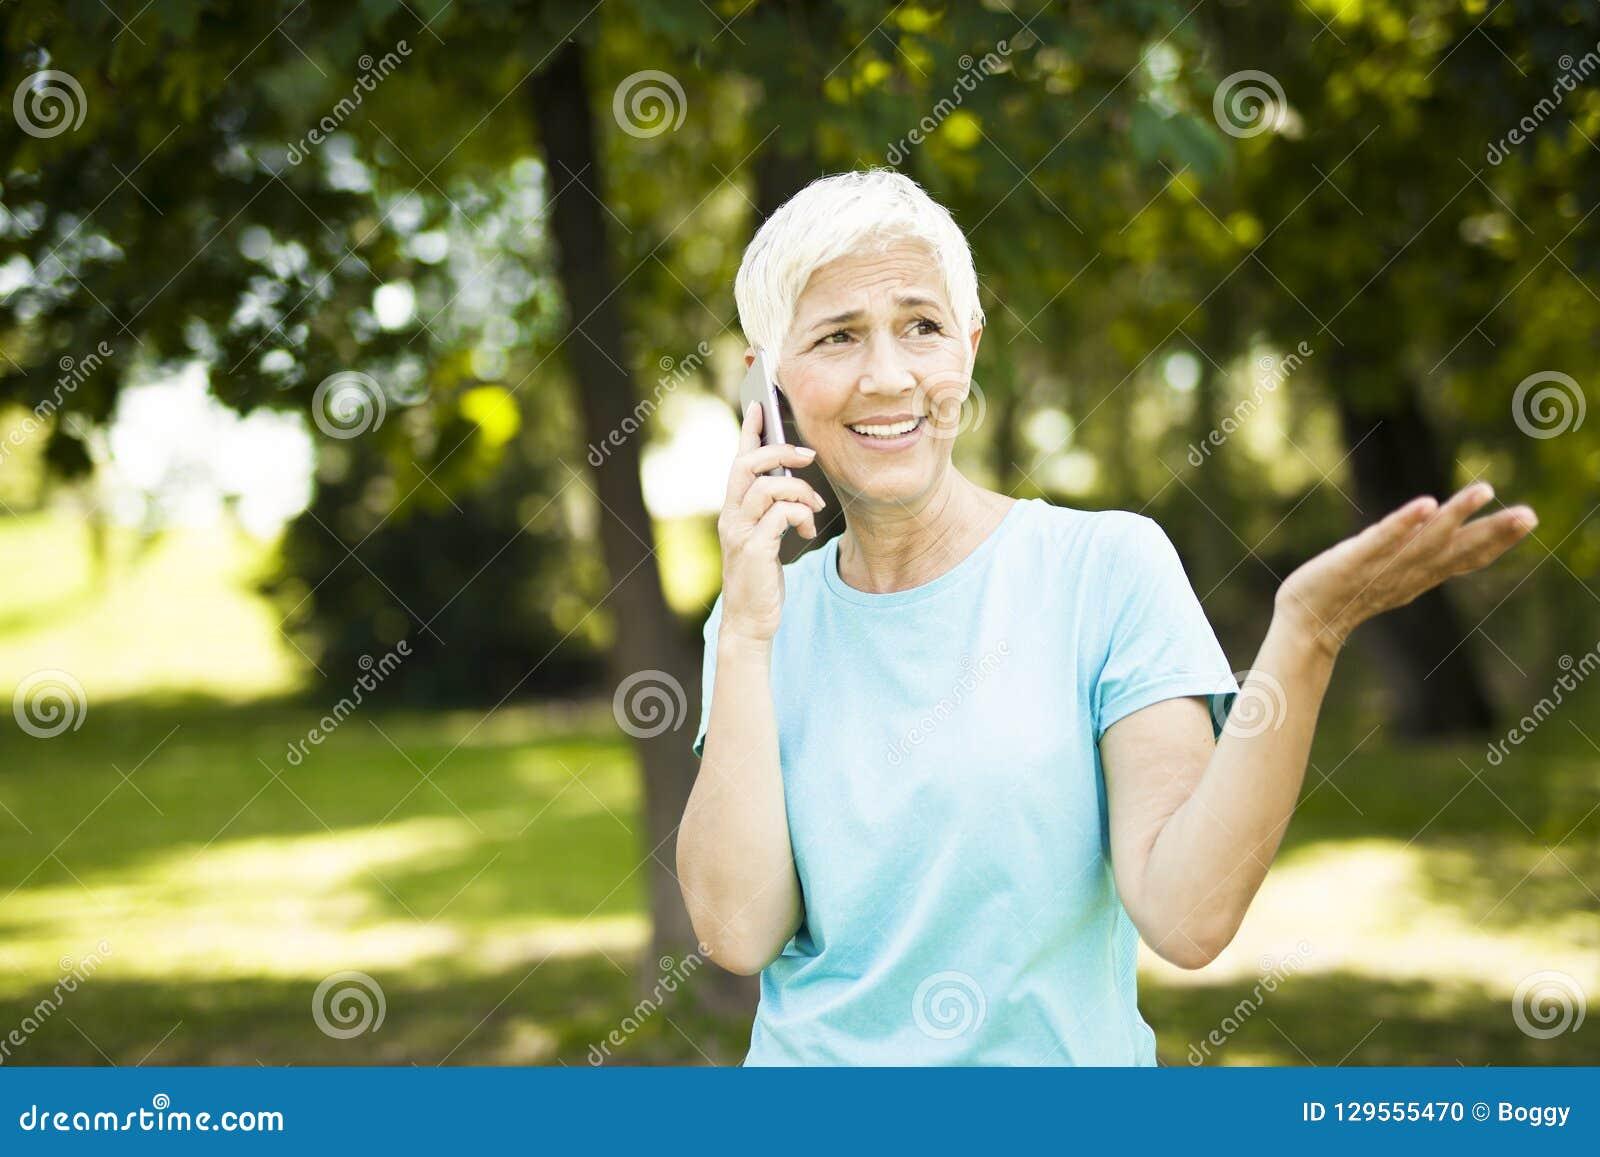 50's Plus Seniors Online Dating Site In Denver